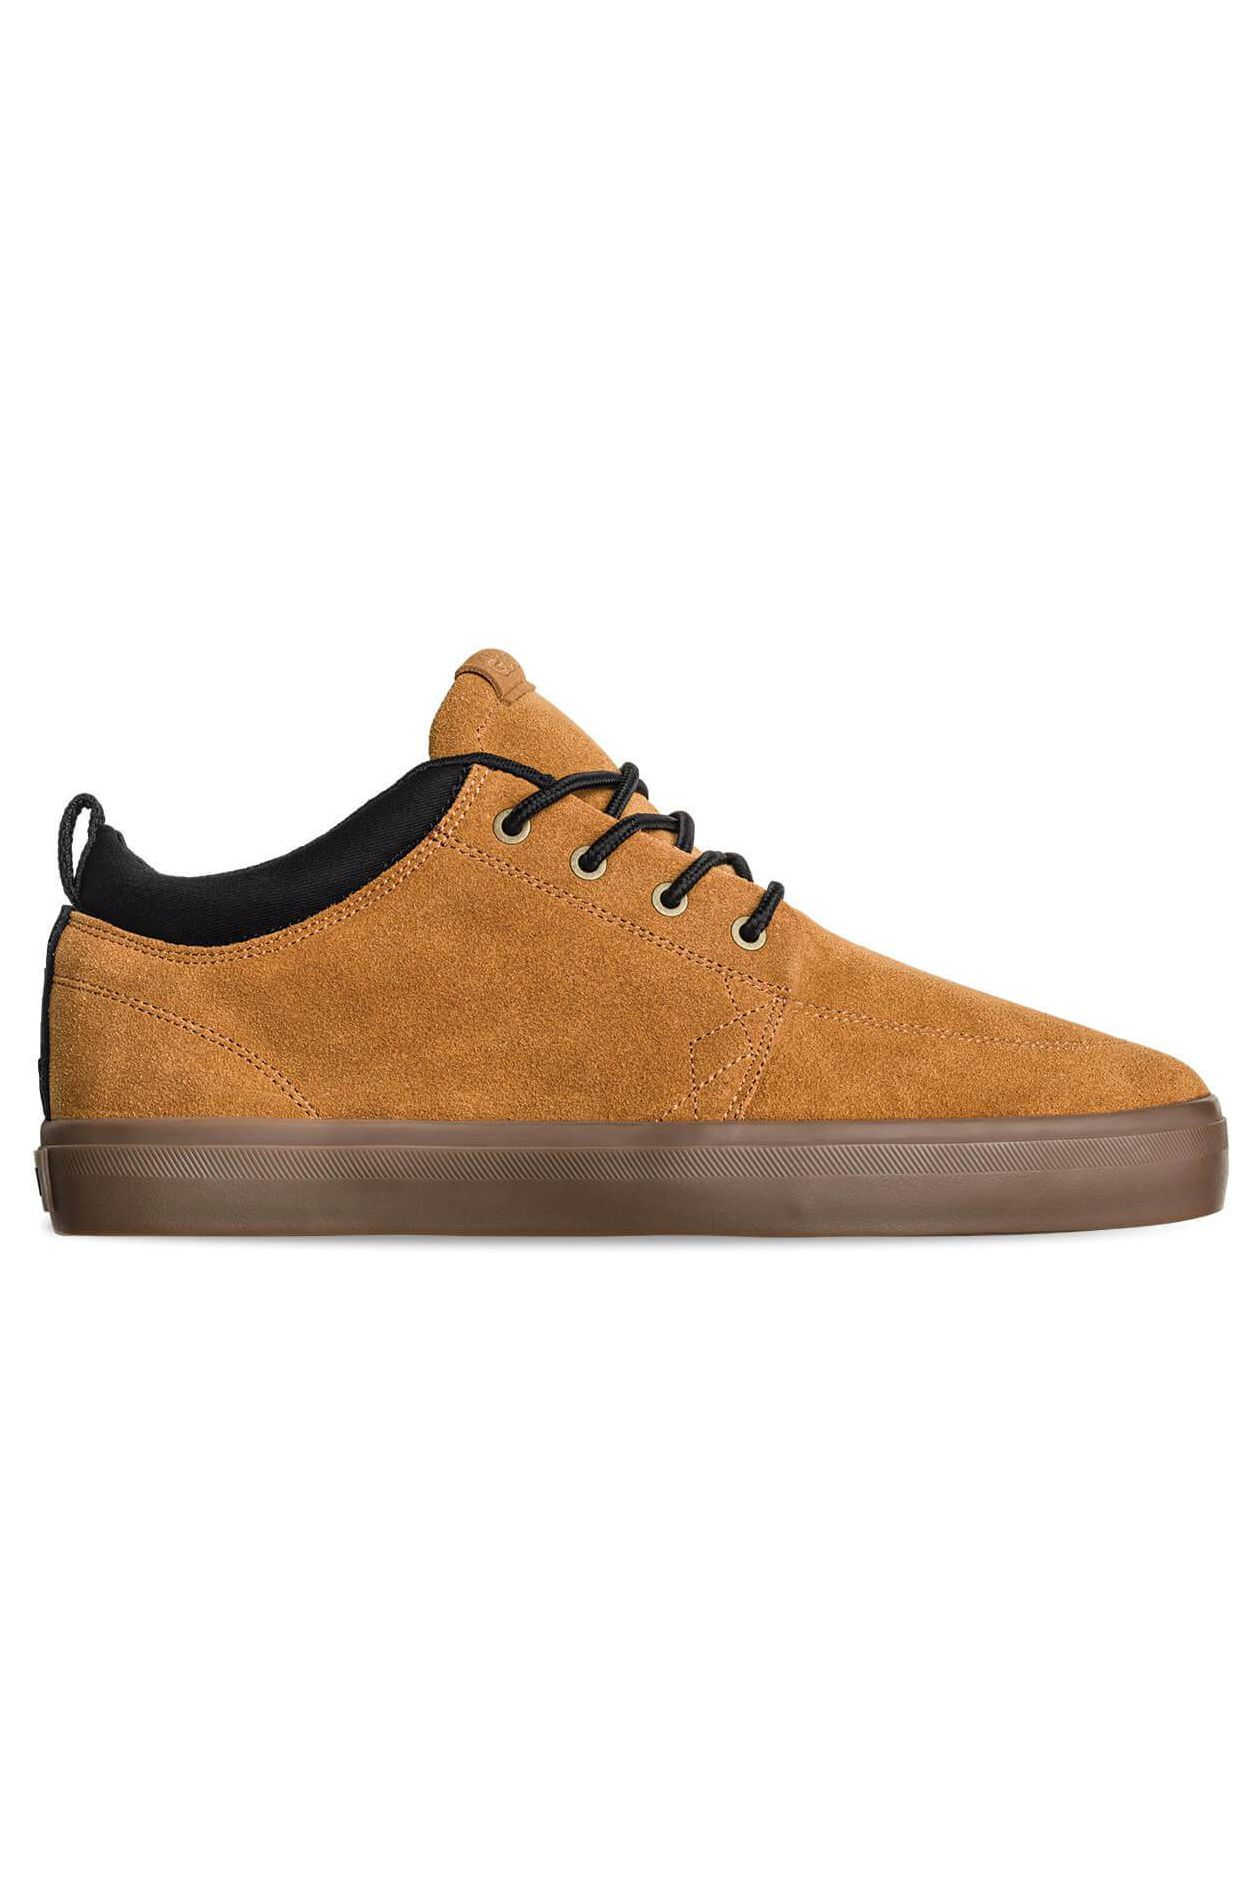 Globe Shoes GS CHUKKA Caramello/Gum